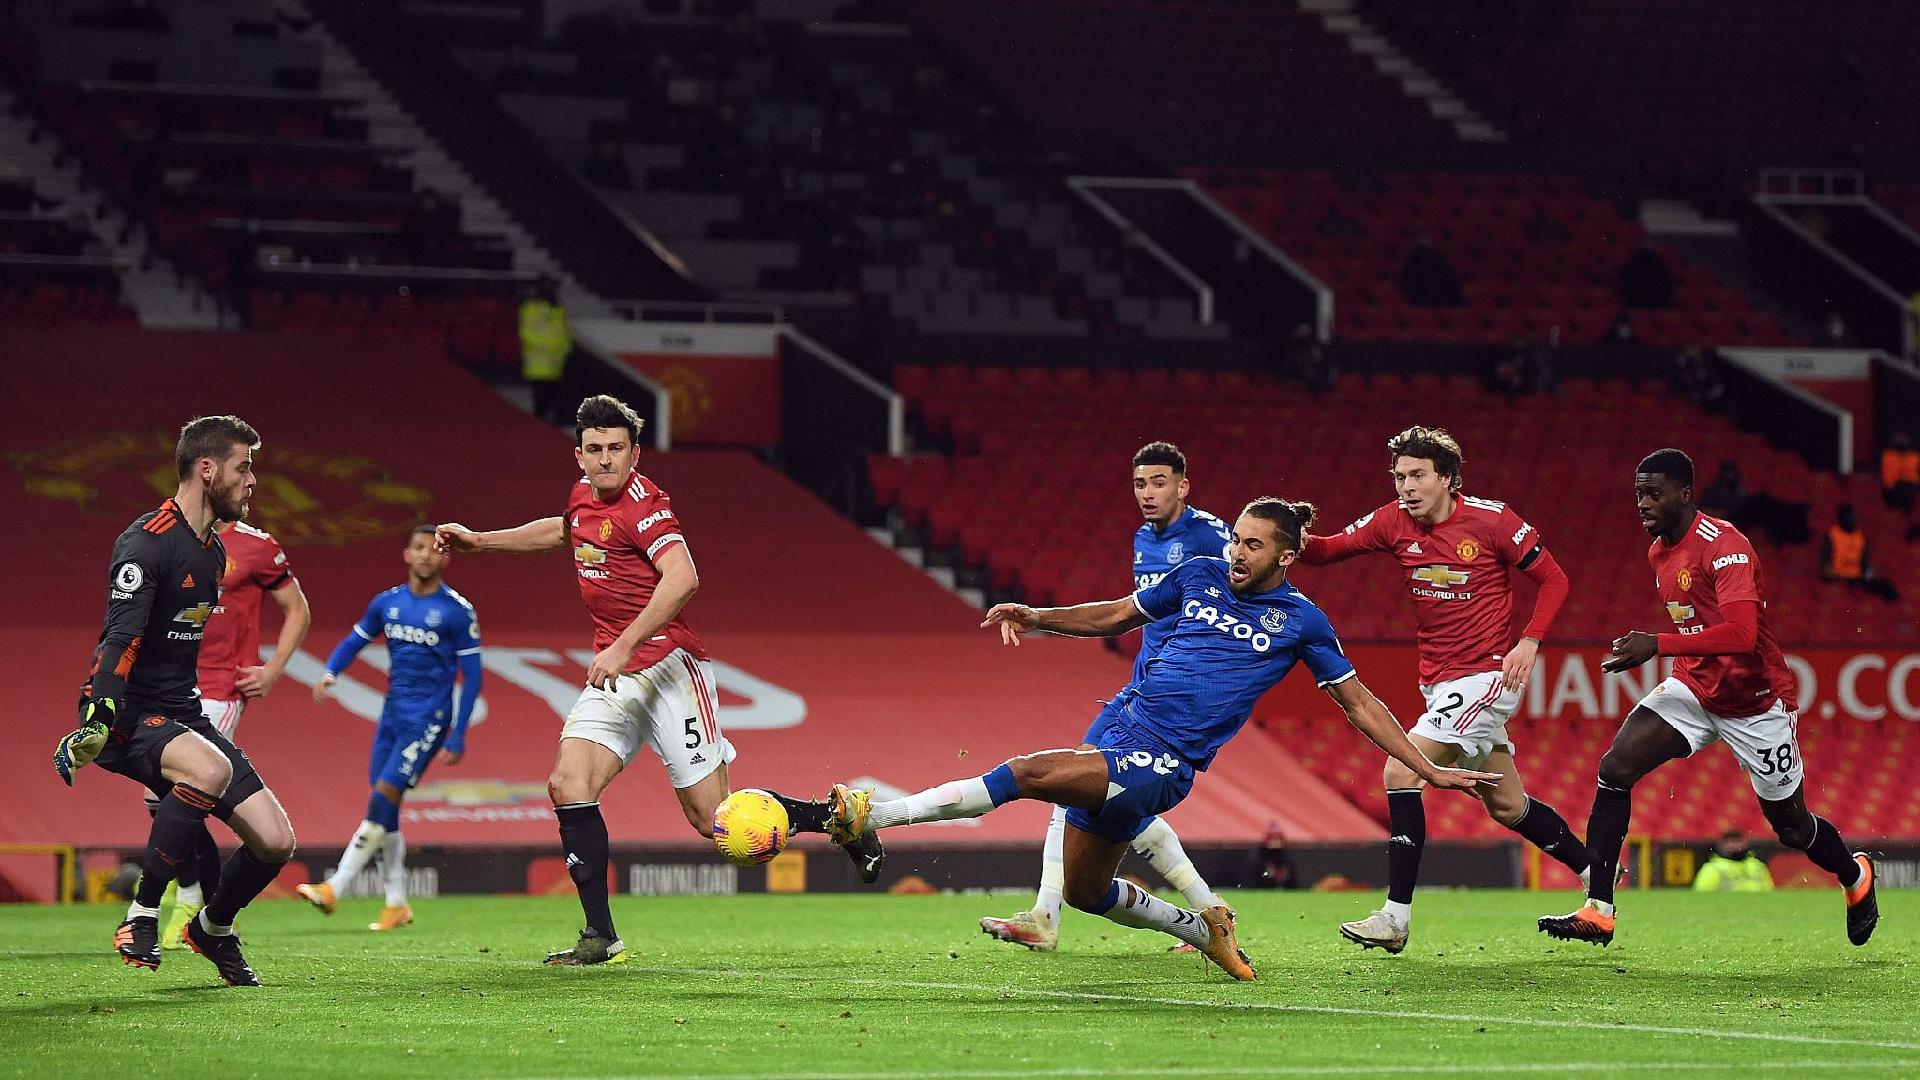 Man Utd rocked by last-gasp equalizer, Newcastle win with nine men - CGTN